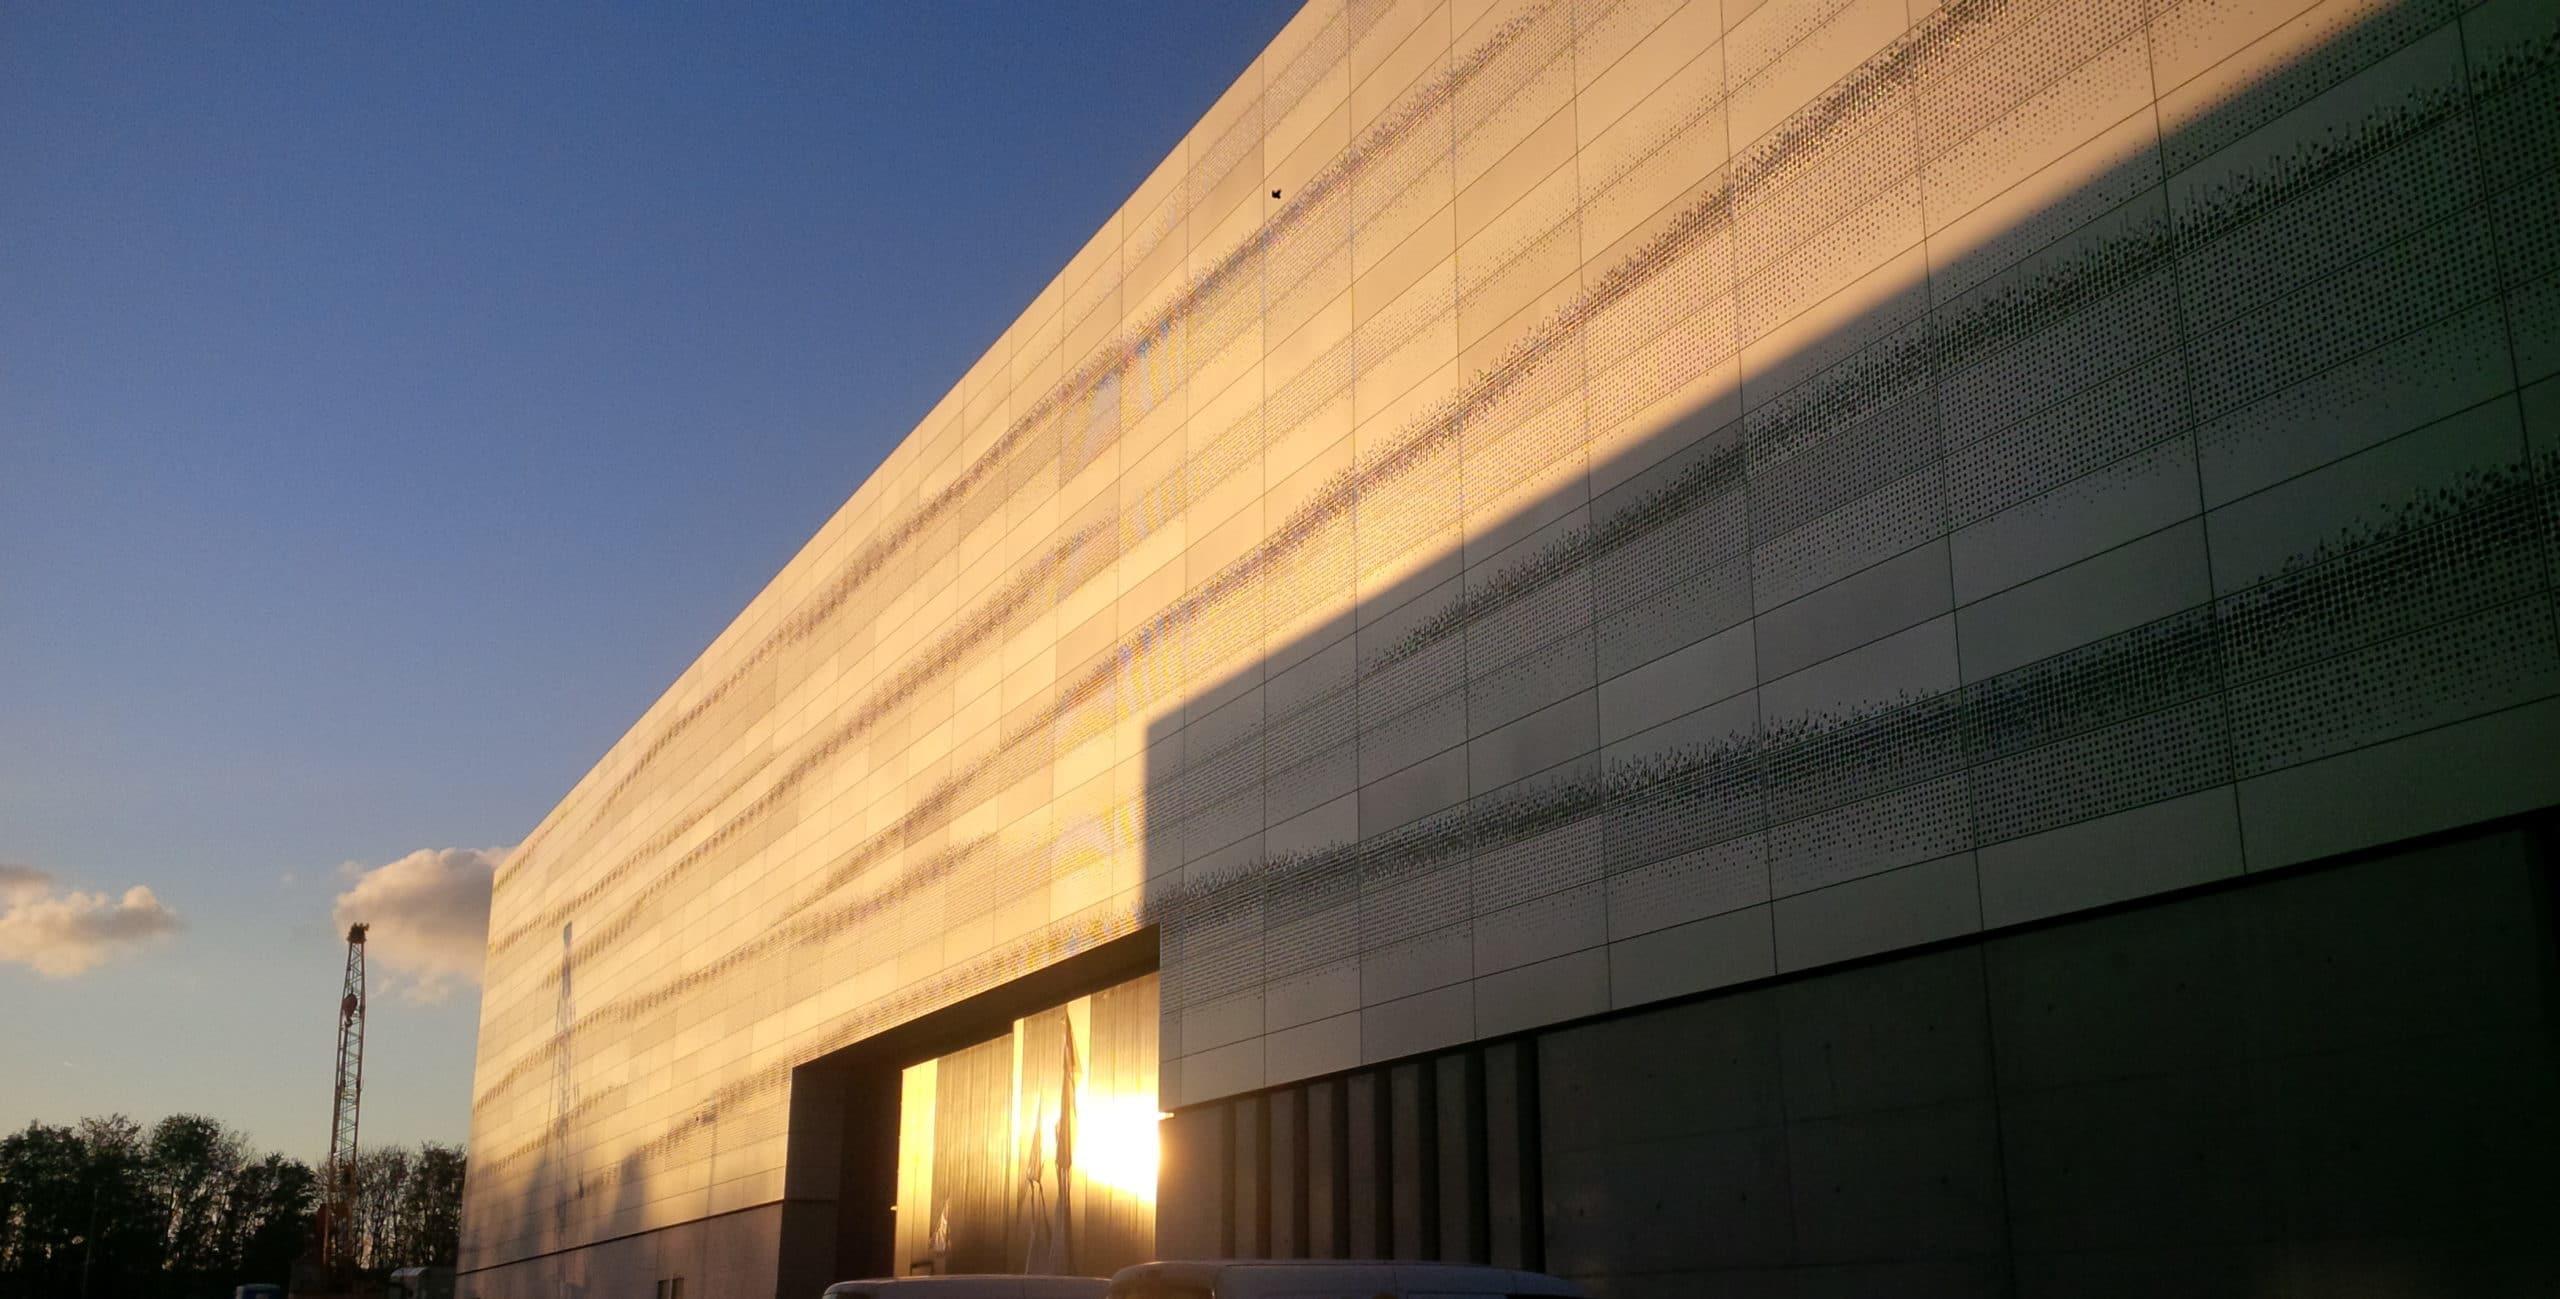 <b>Center for Wind Power Drivers RWTH Aachen</b>